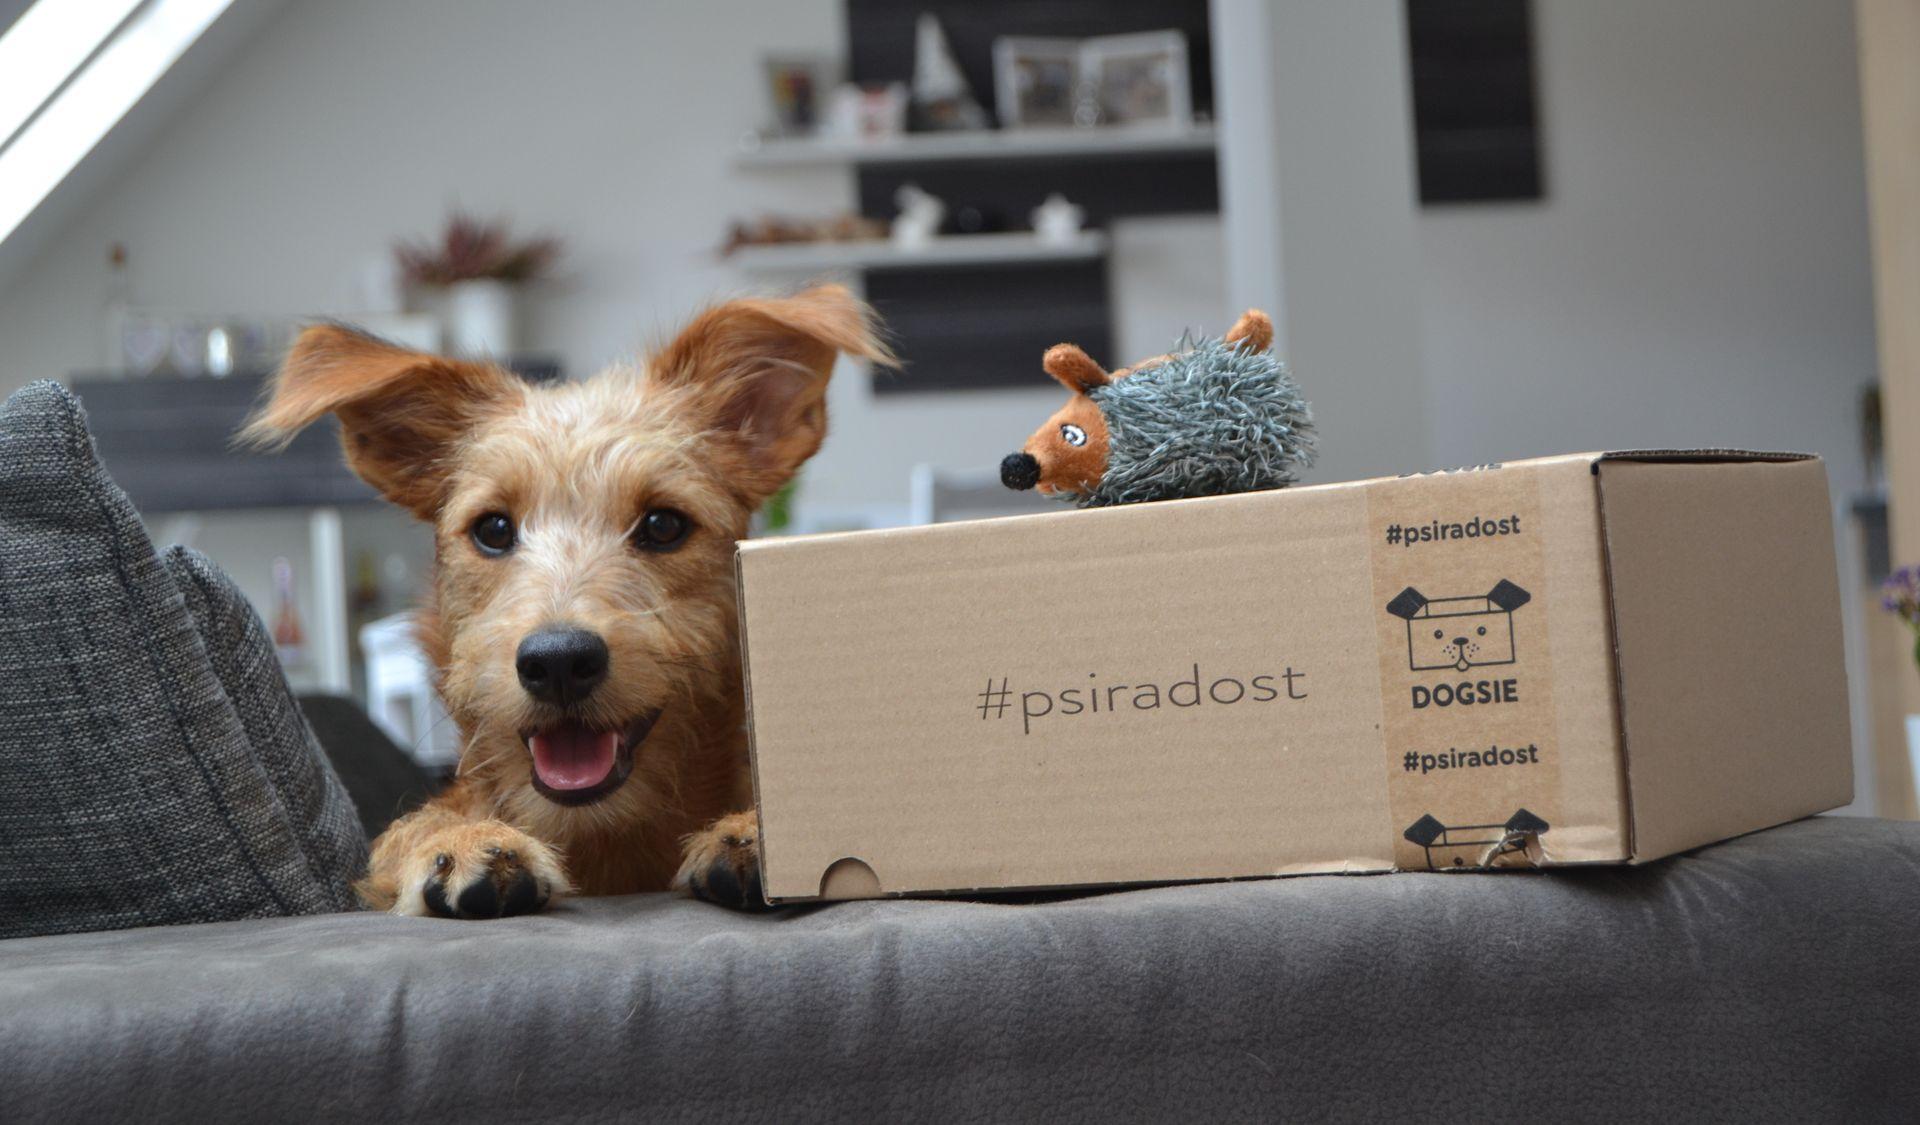 krabicka plna psi radosti